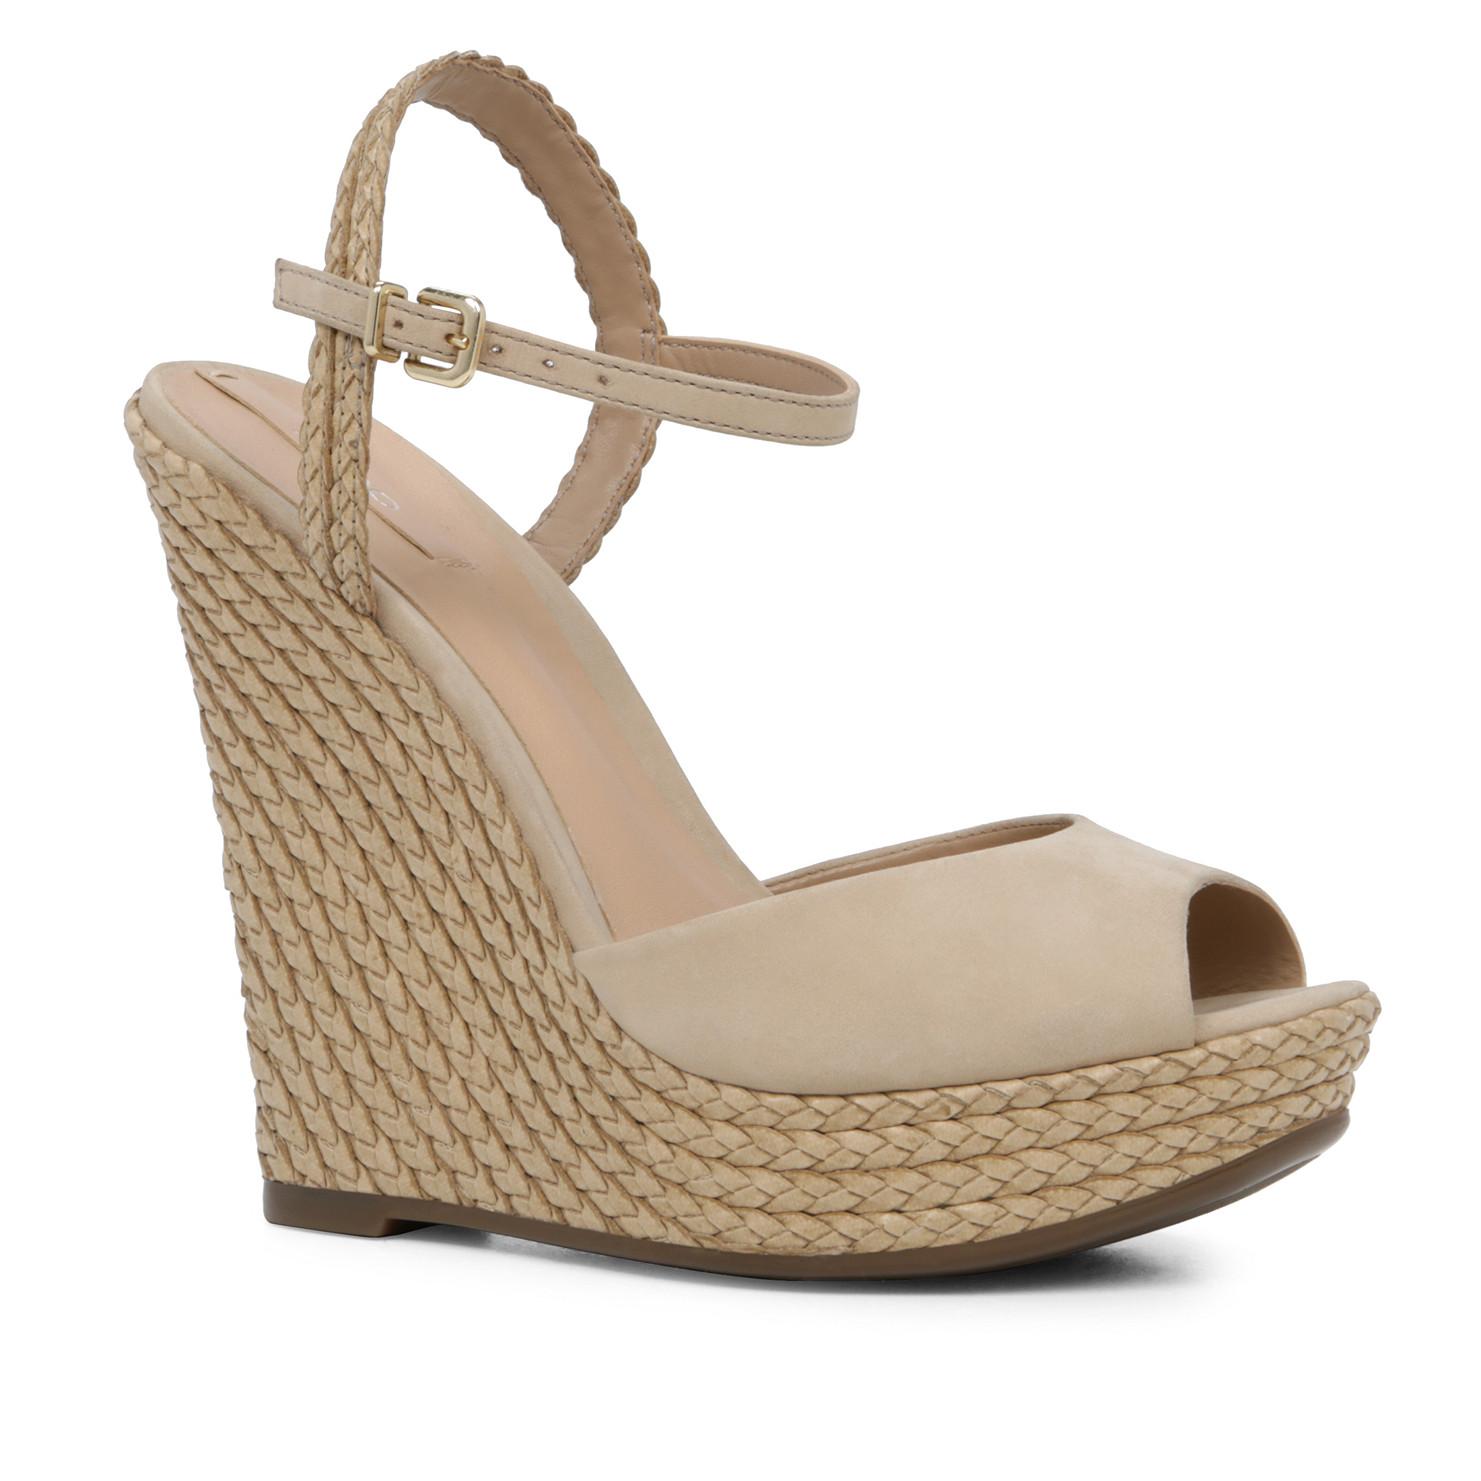 Womens sandals wedges - Shizuko Wedge Sandals Women S Sandals Aldoshoes Com